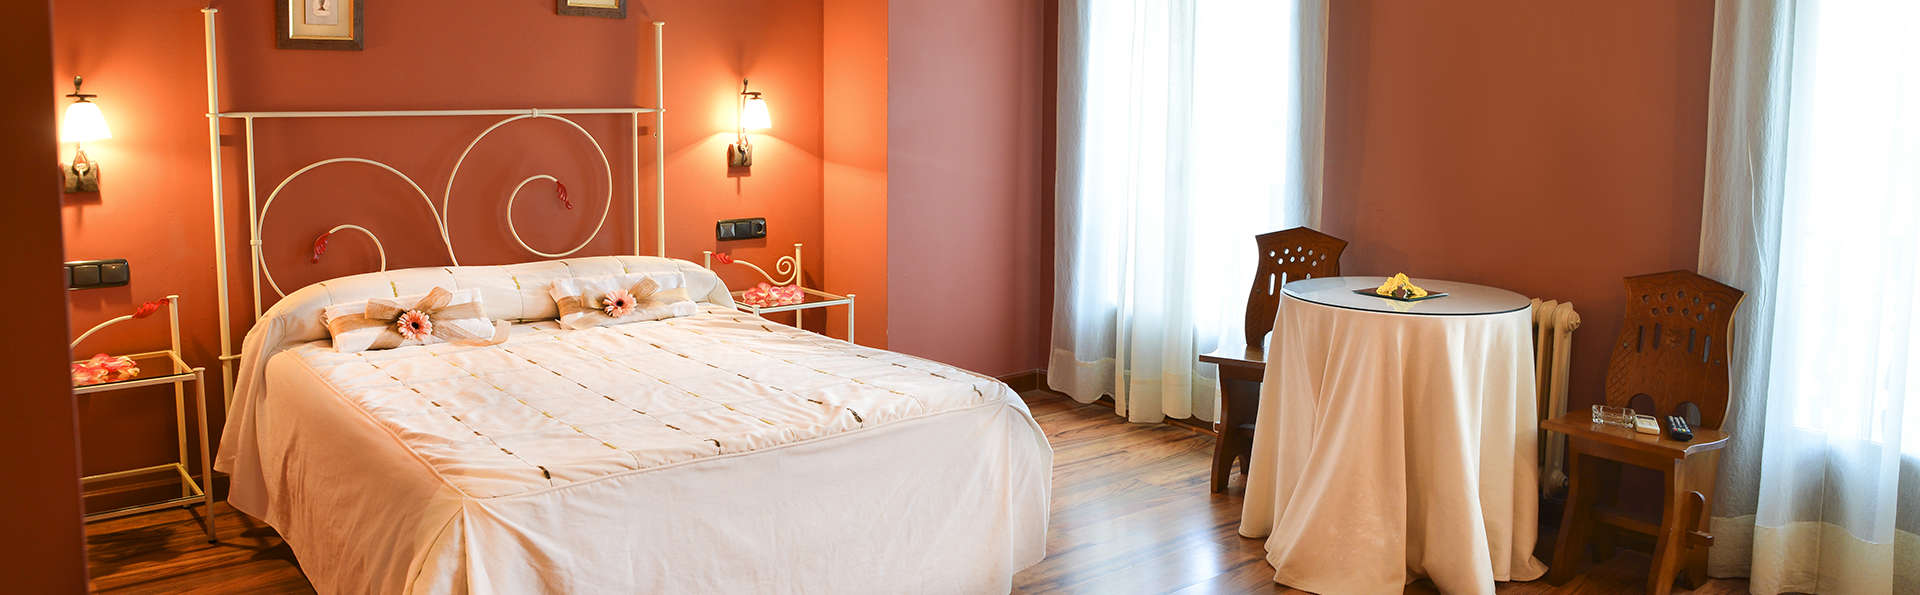 Hotel Jefi - Edit_Room112.jpg